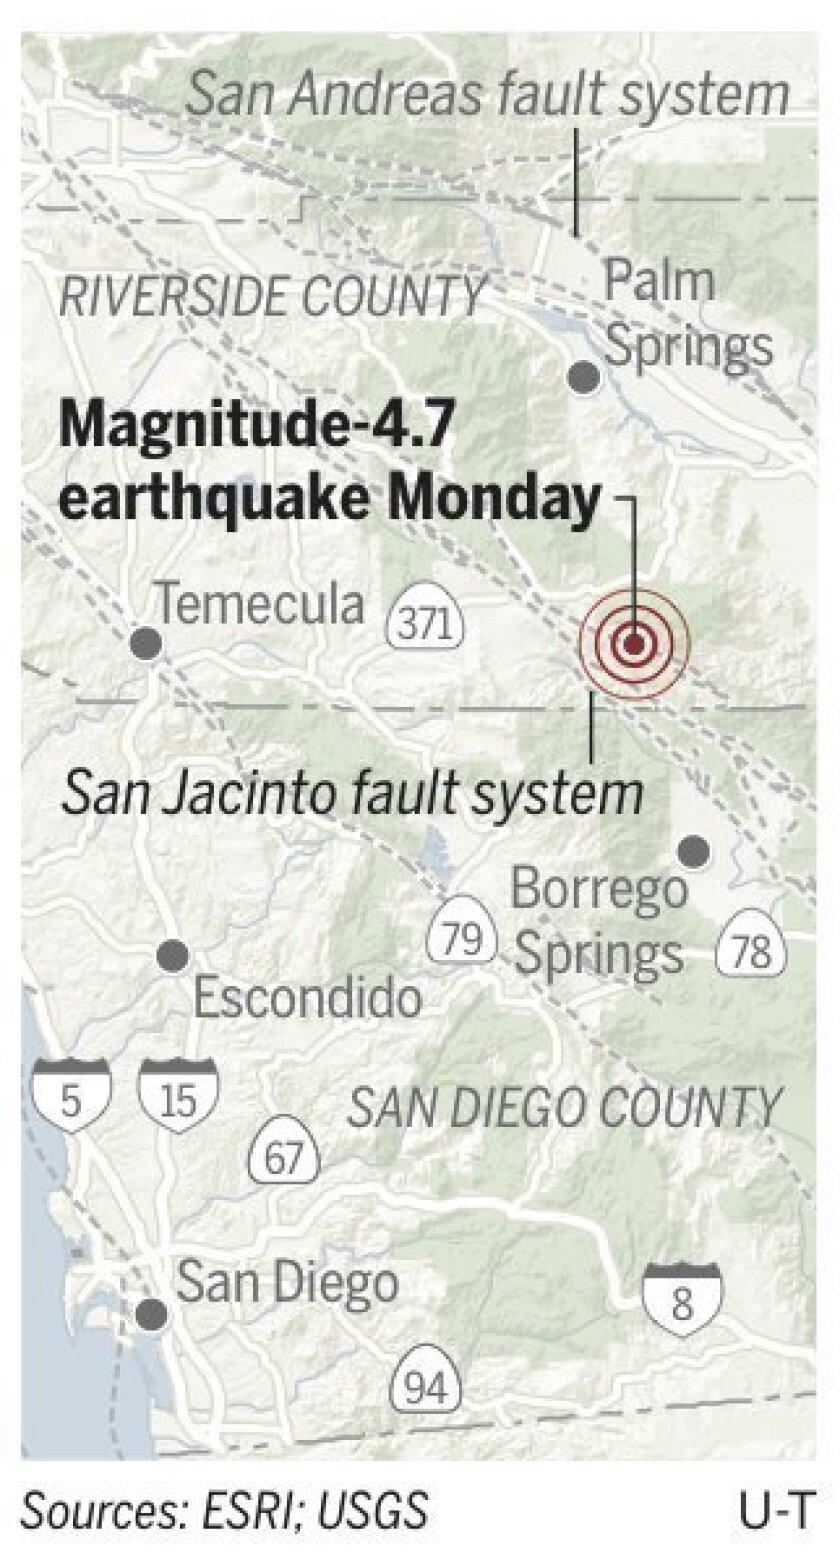 Monday's earthquake occurred on the San Jacinto fault system.